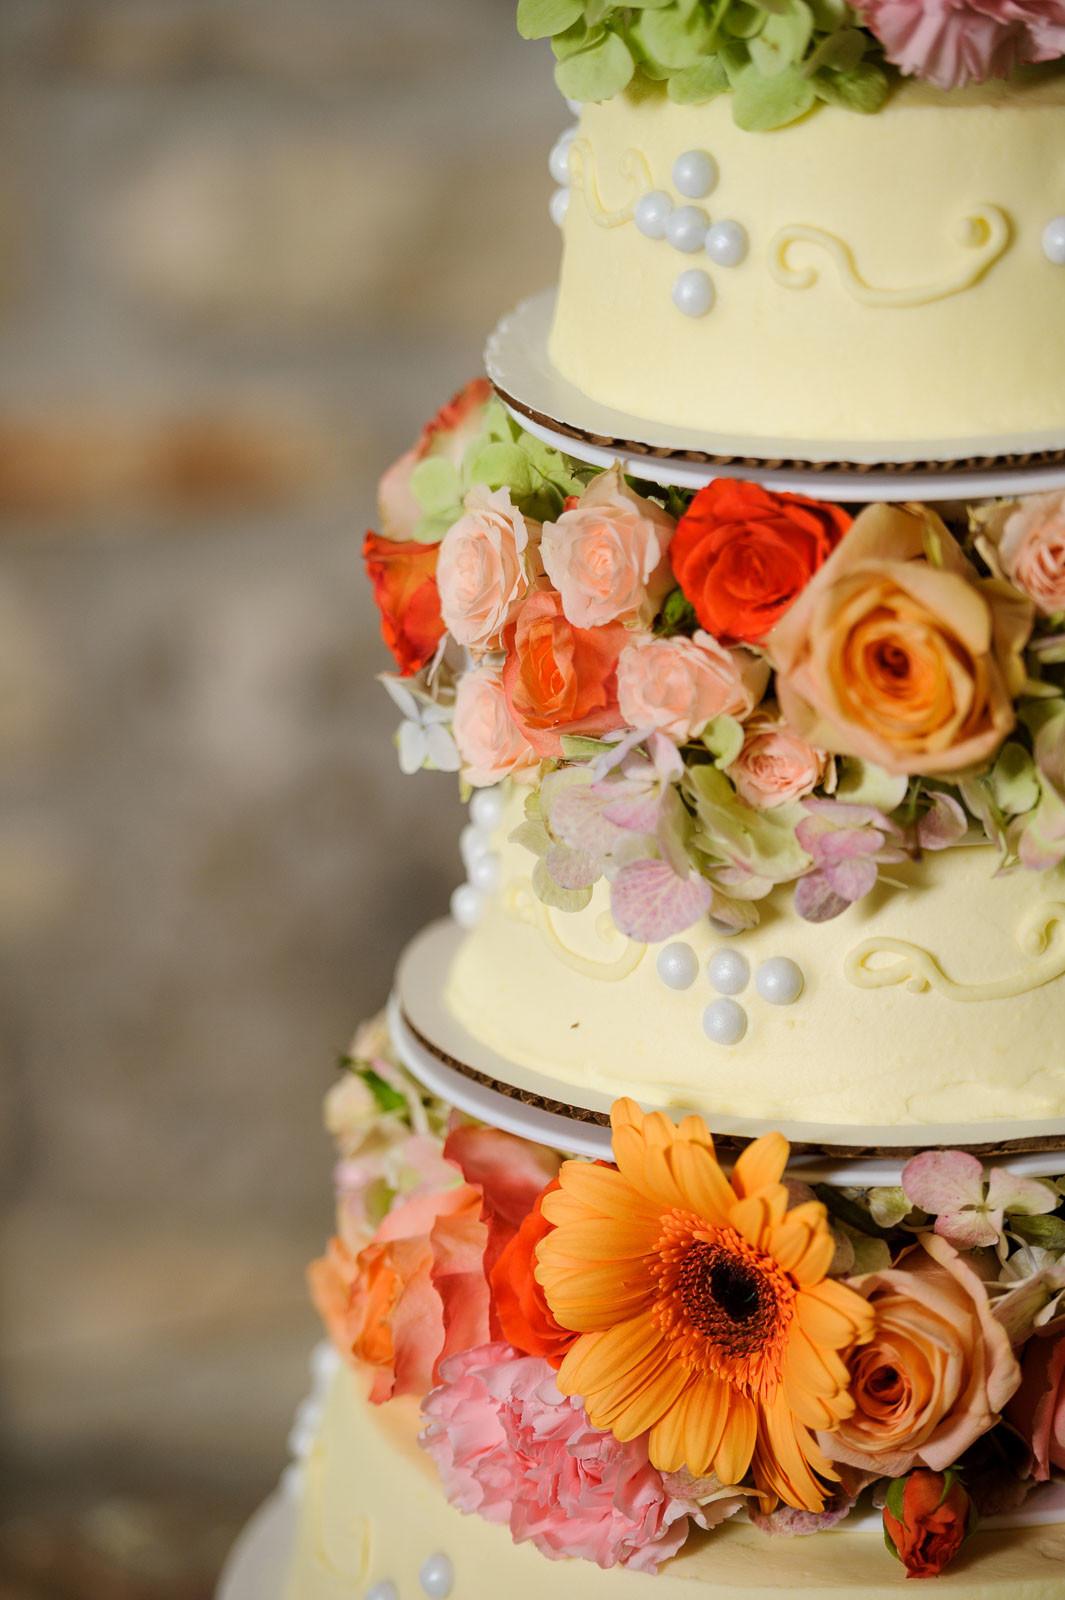 Featured Wedding Cakes - DIY Wedding Cakes - Cake Highlights - Austin Wedding Photographers -Nancy and Jaime Wedding